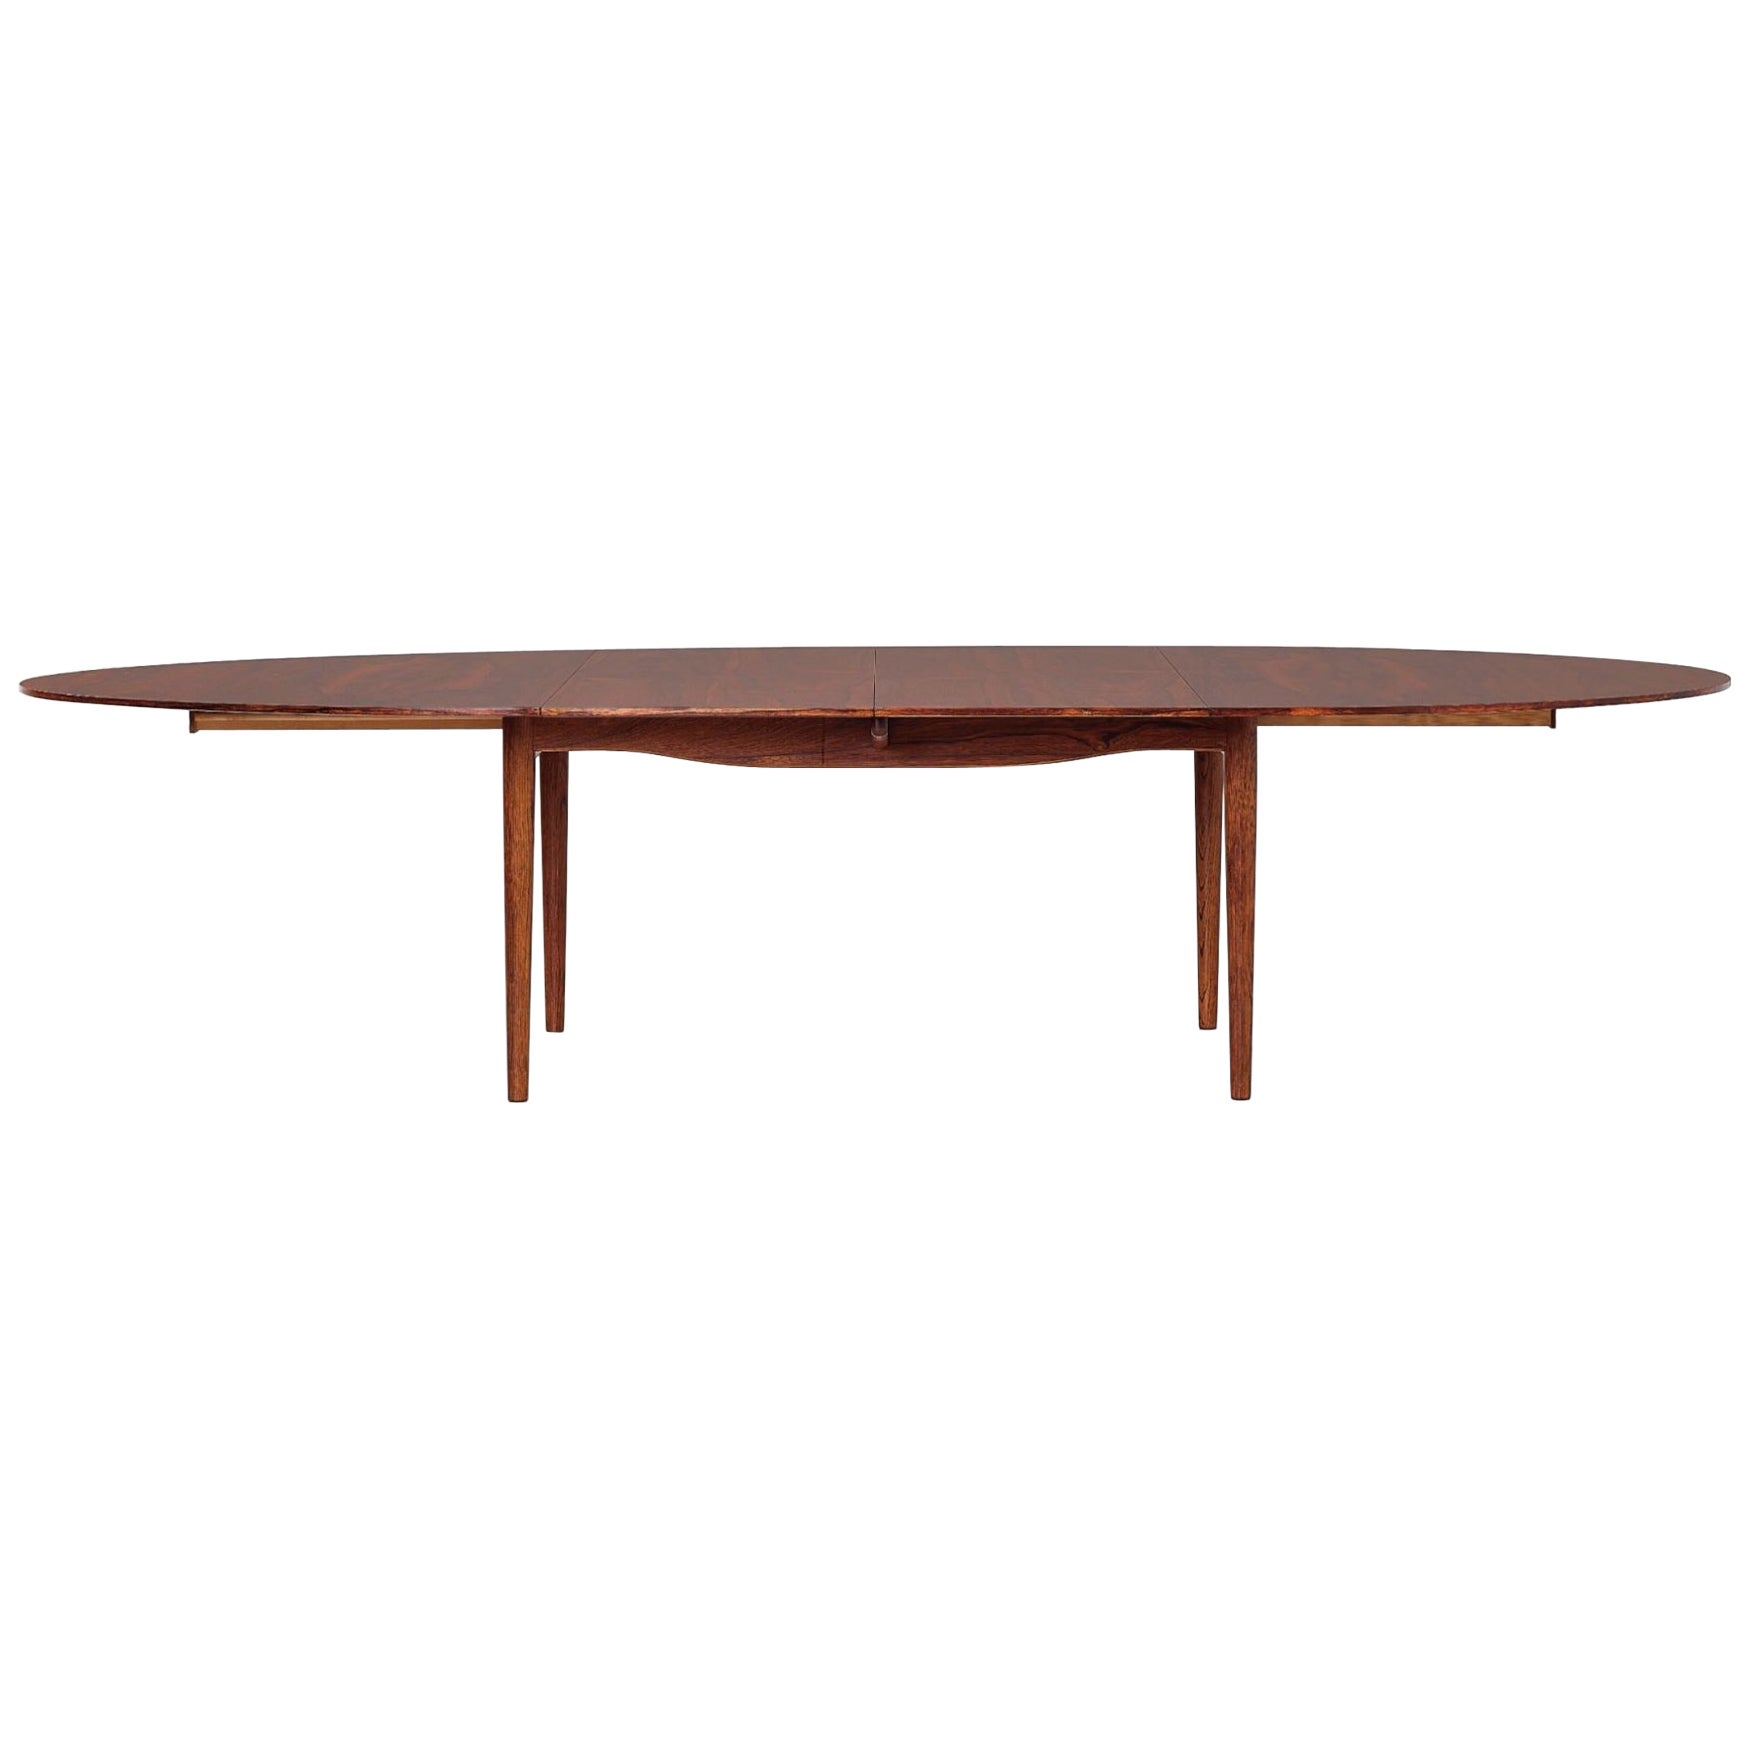 Finn Juhl Large 'Judas' Dining Table in Brazilian Rosewood for Niels Vodder 1949